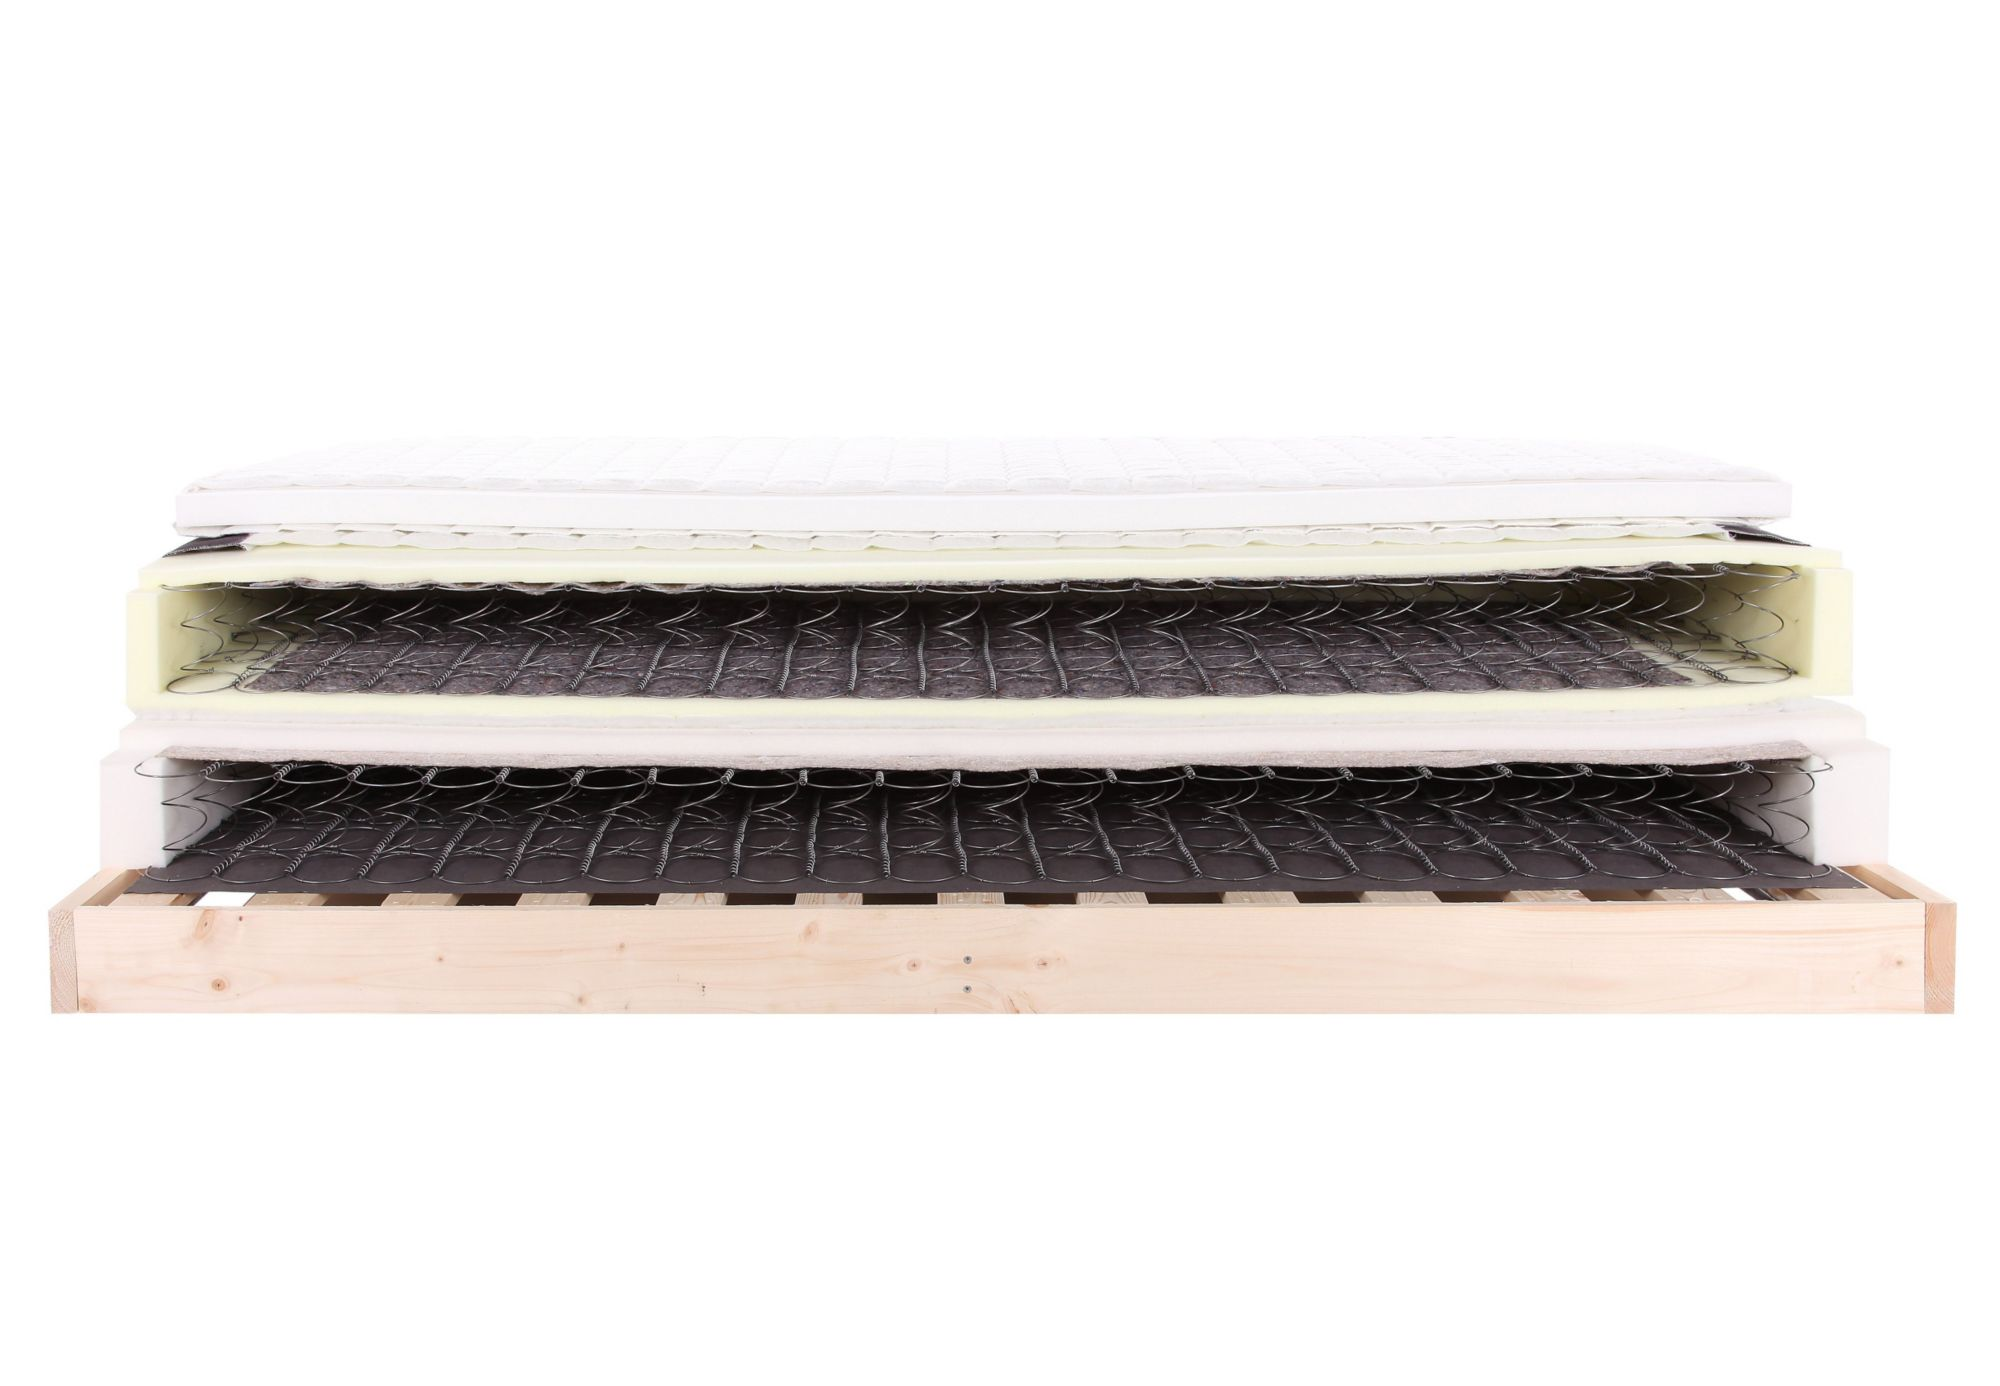 boxspringbett breckle made in germany schwab versand boxspringbetten ohne bettkasten. Black Bedroom Furniture Sets. Home Design Ideas